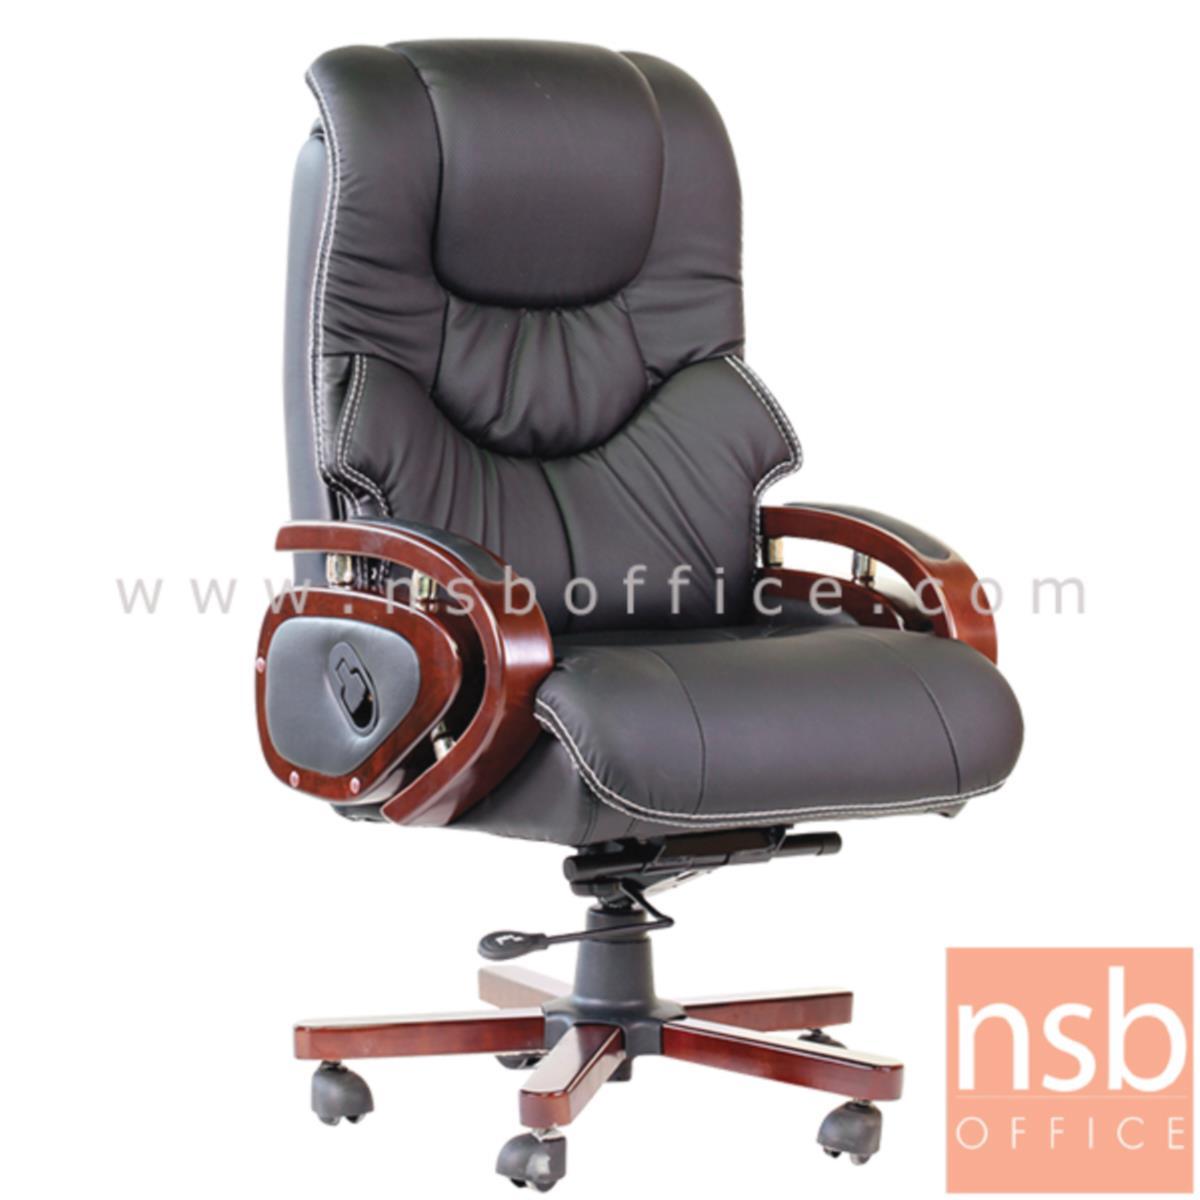 B25A034:เก้าอี้ผู้บริหารหนัง PU  รุ่น Staton (สตาตัน)  โช๊คแก๊ส ขาไม้